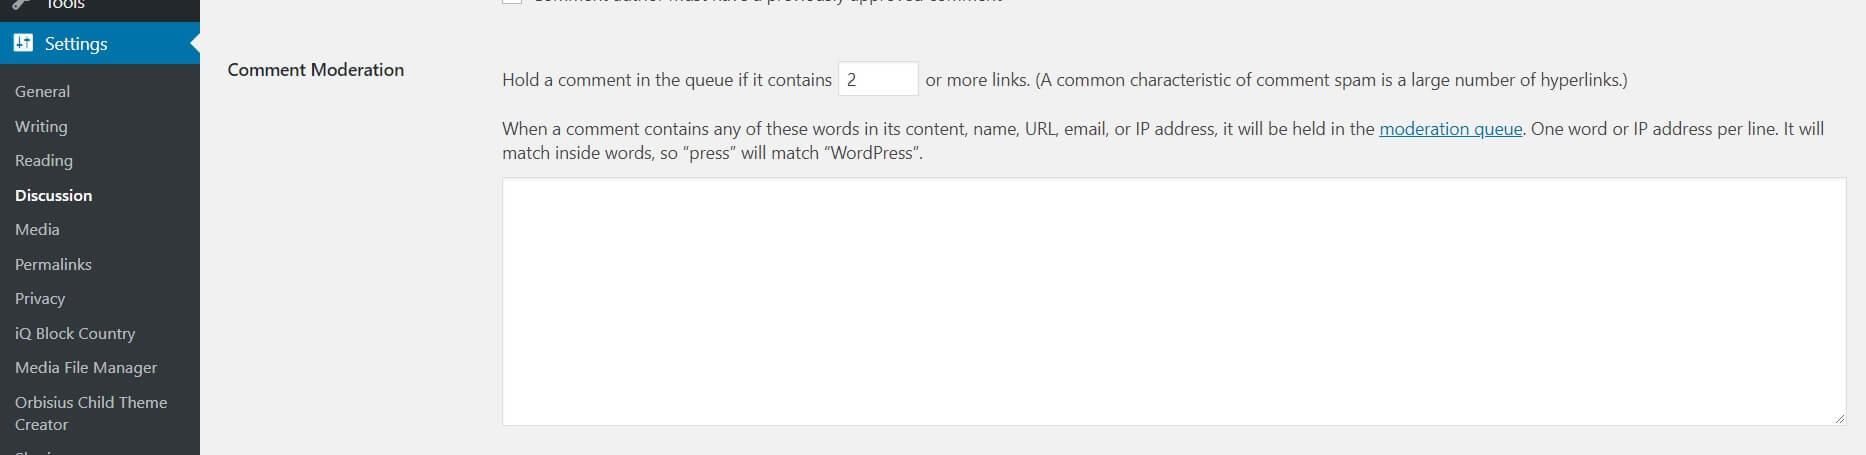 WordPress' Comment Moderation settings